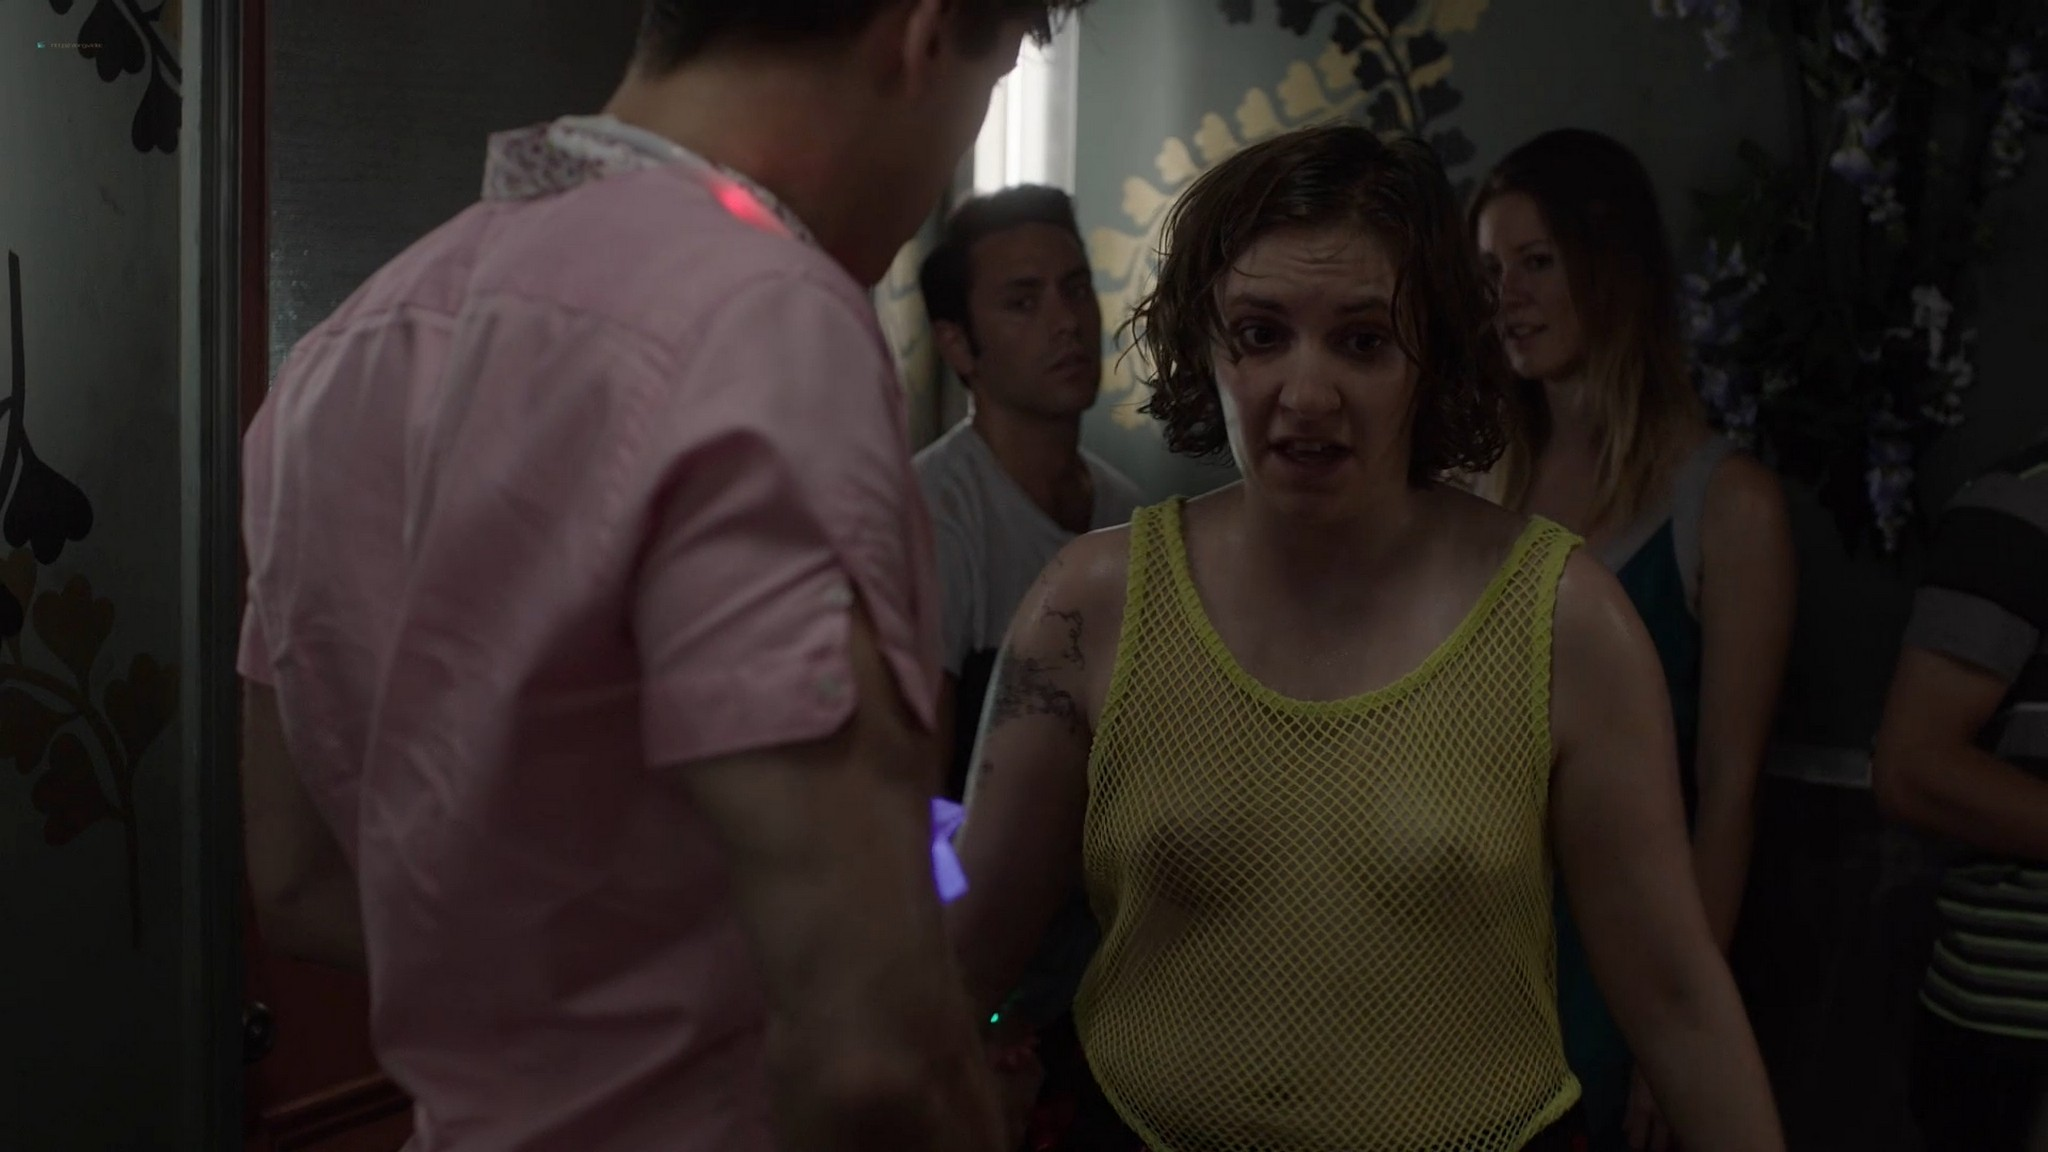 Allison Williams sex Lena Dunham nude Zosia Mamet hot Jemima Kirke nude Girls 2012 s2e1 5 1080p Web 10